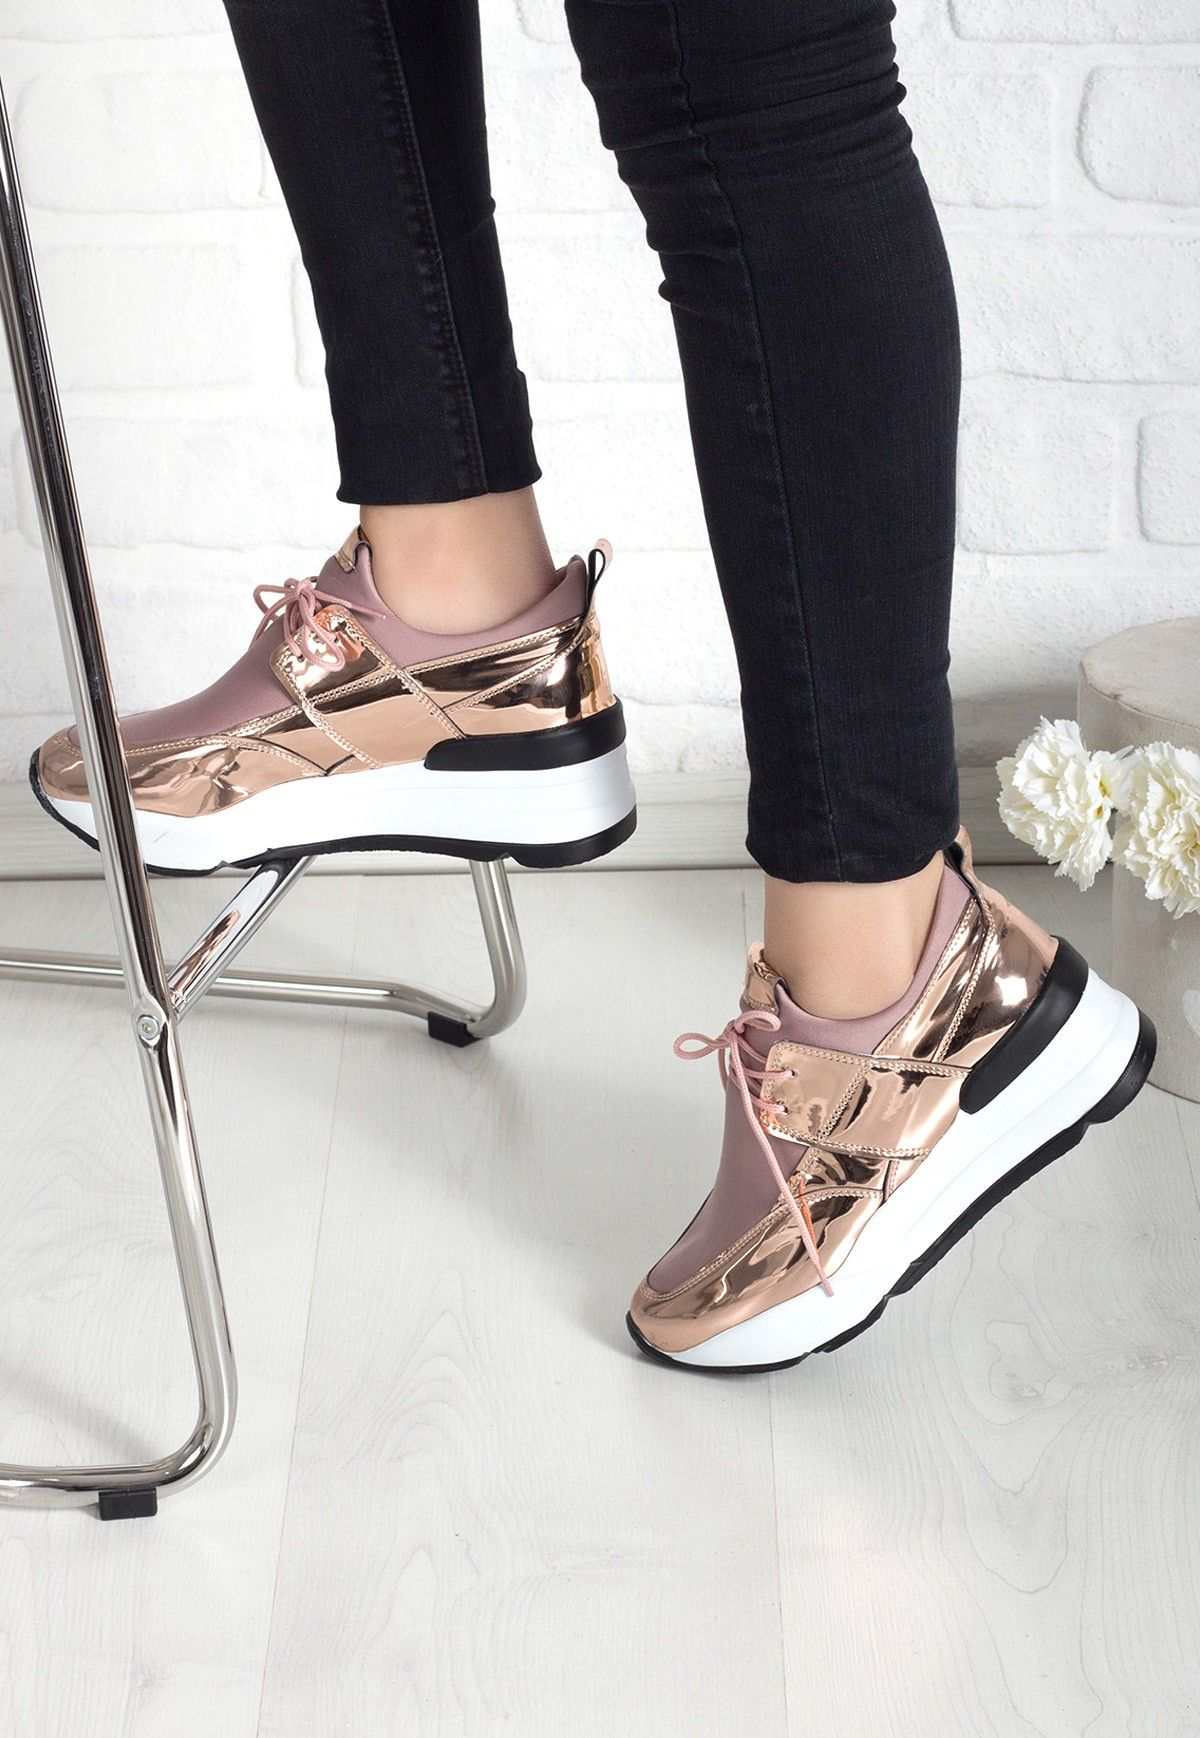 Velerina Gold Bayan Spor Ayakkabi Her Gun Indirimli Ayakkabi Icin Indirimliayakkabi Com Ayakkabi Indiri Elegant Sneakers Fantastic Shoes Sneakers Fashion